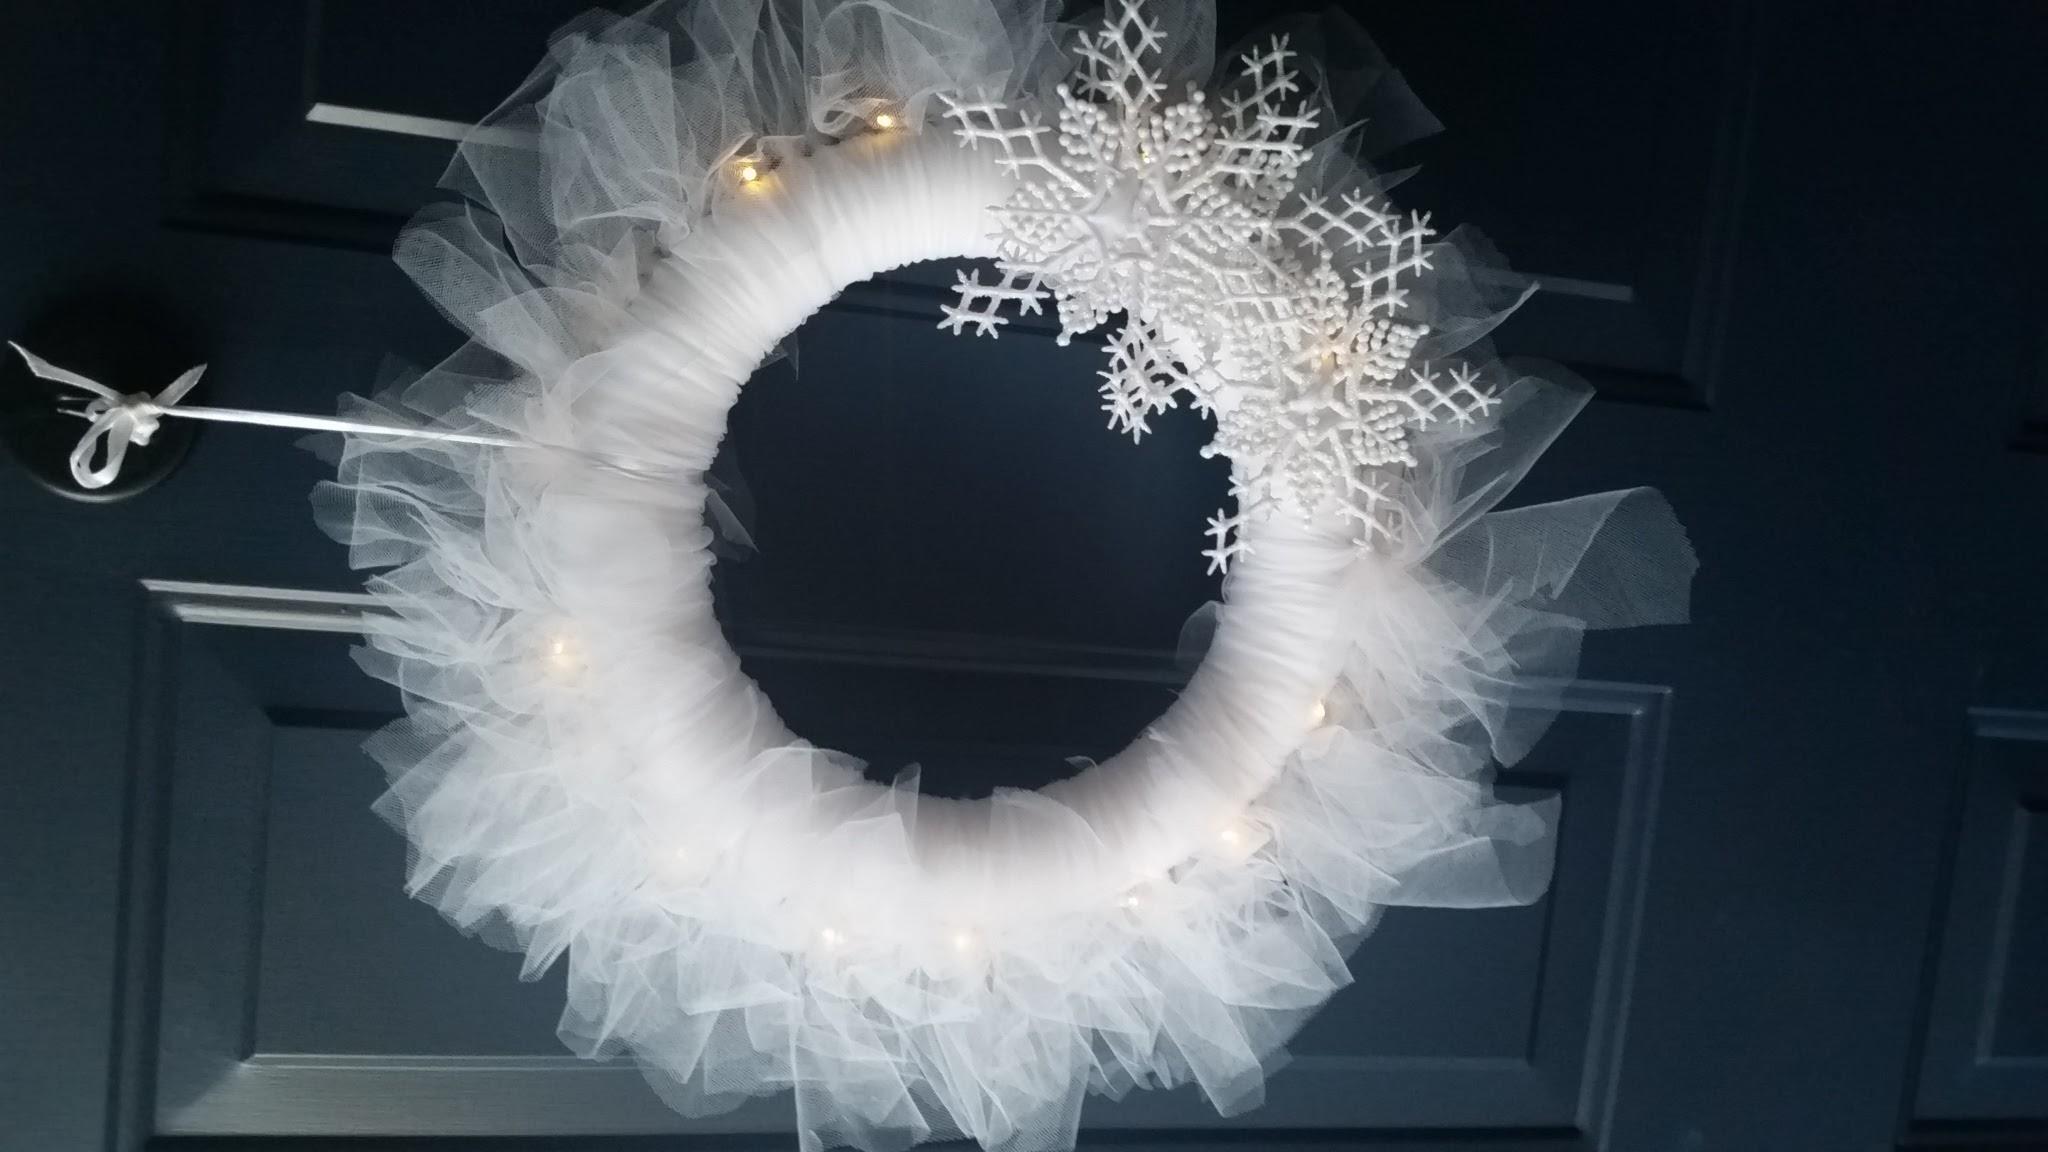 Snowflake wreath lights the winter air